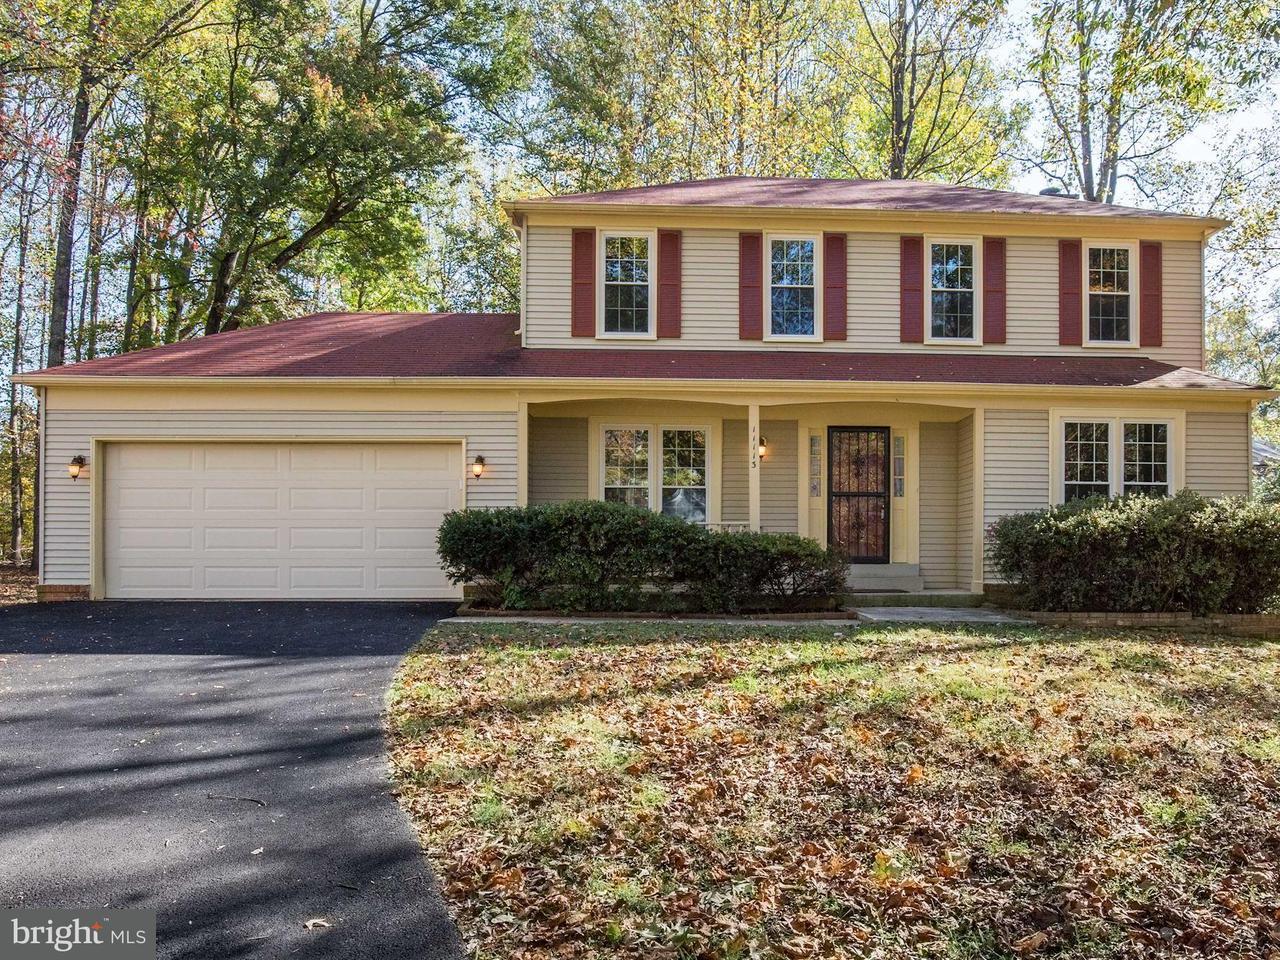 Single Family Home for Sale at 11113 LORAN Road 11113 LORAN Road Great Falls, Virginia 22066 United States